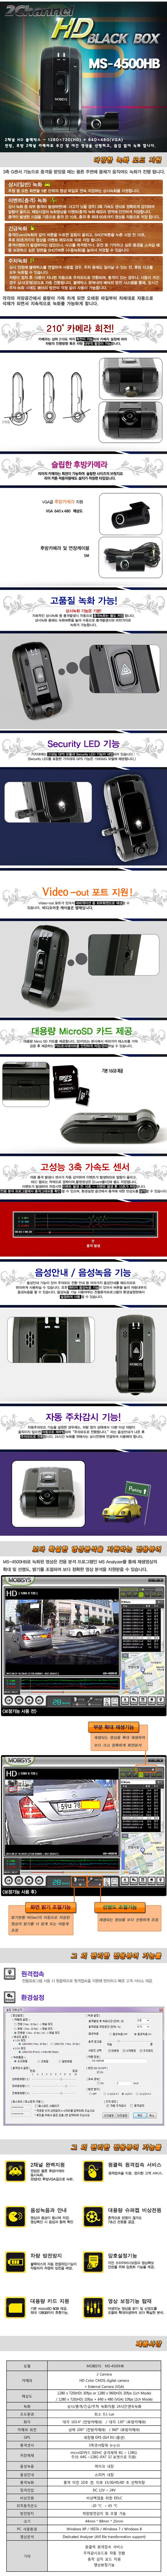 [MOBISYS] 모비시스 MS-4500HB, 시큐리티 주차감시 2채널 HD 블랙박스 16기가